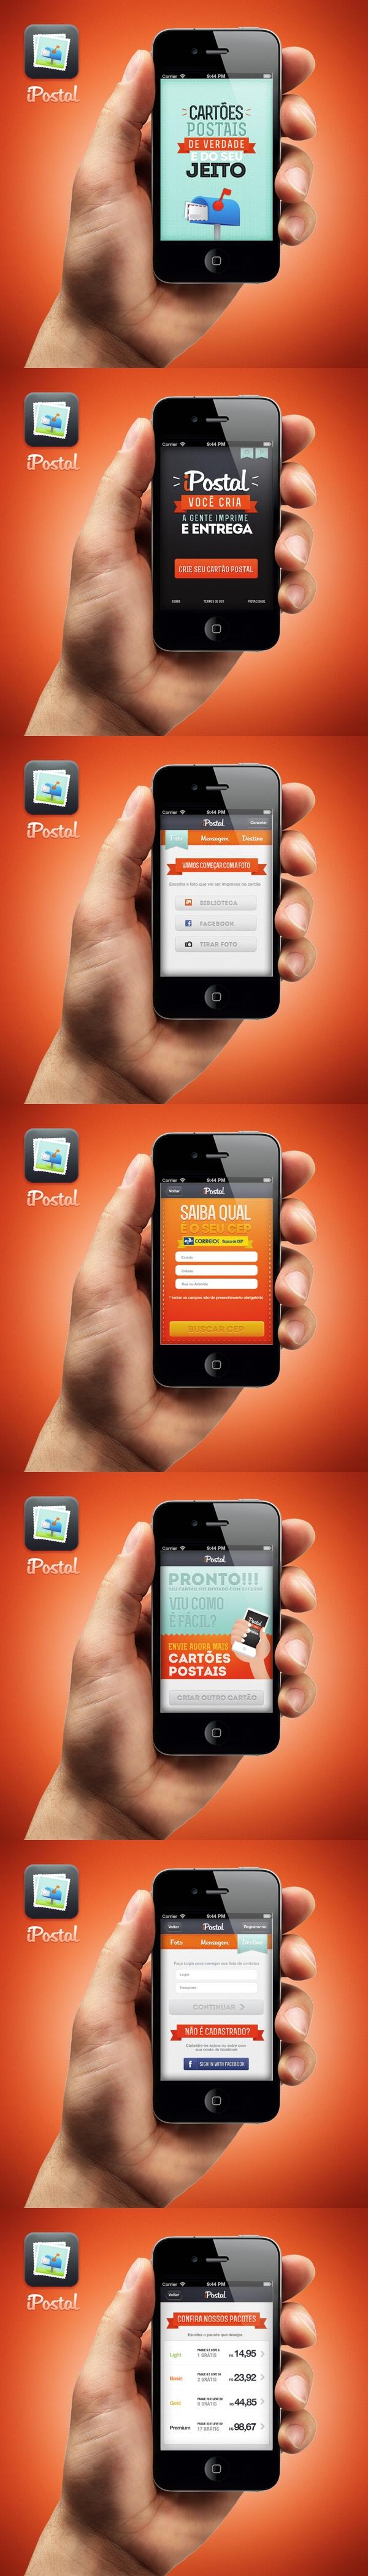 iPostal app by Leonardo Zem, via Behance